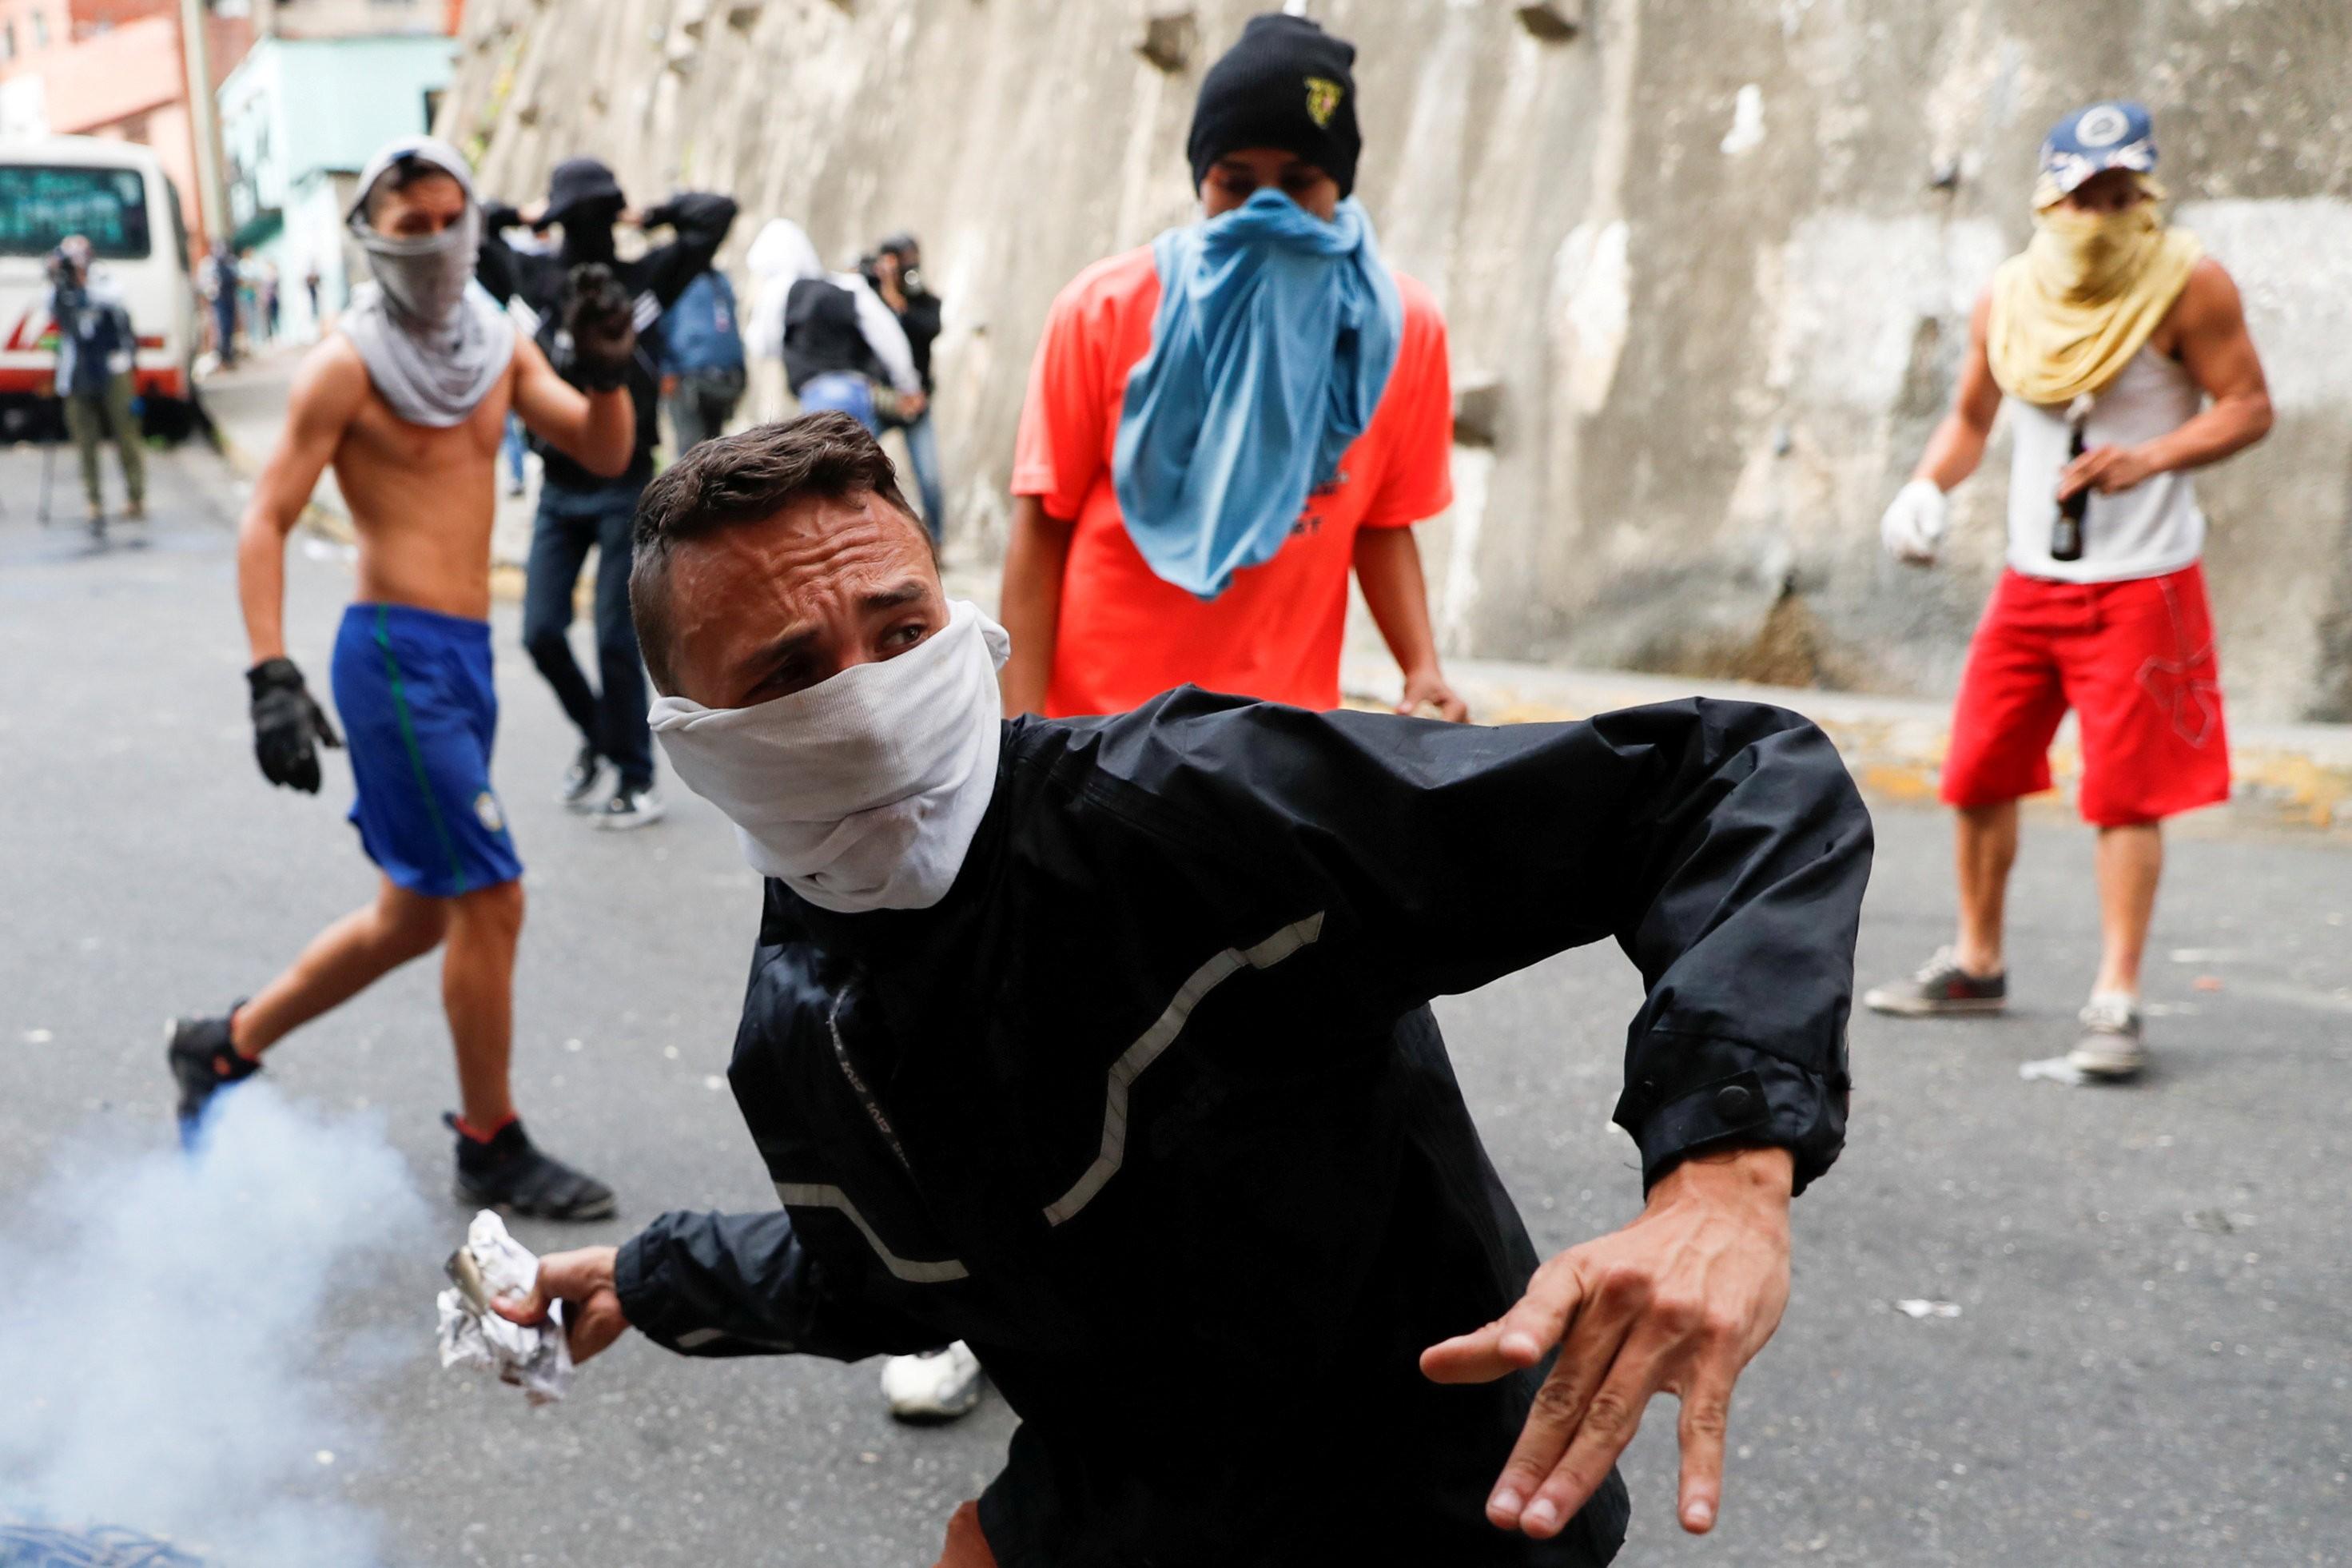 Manifestante joga de volta uma bomba de gás lacrimogêneo durante  protesto